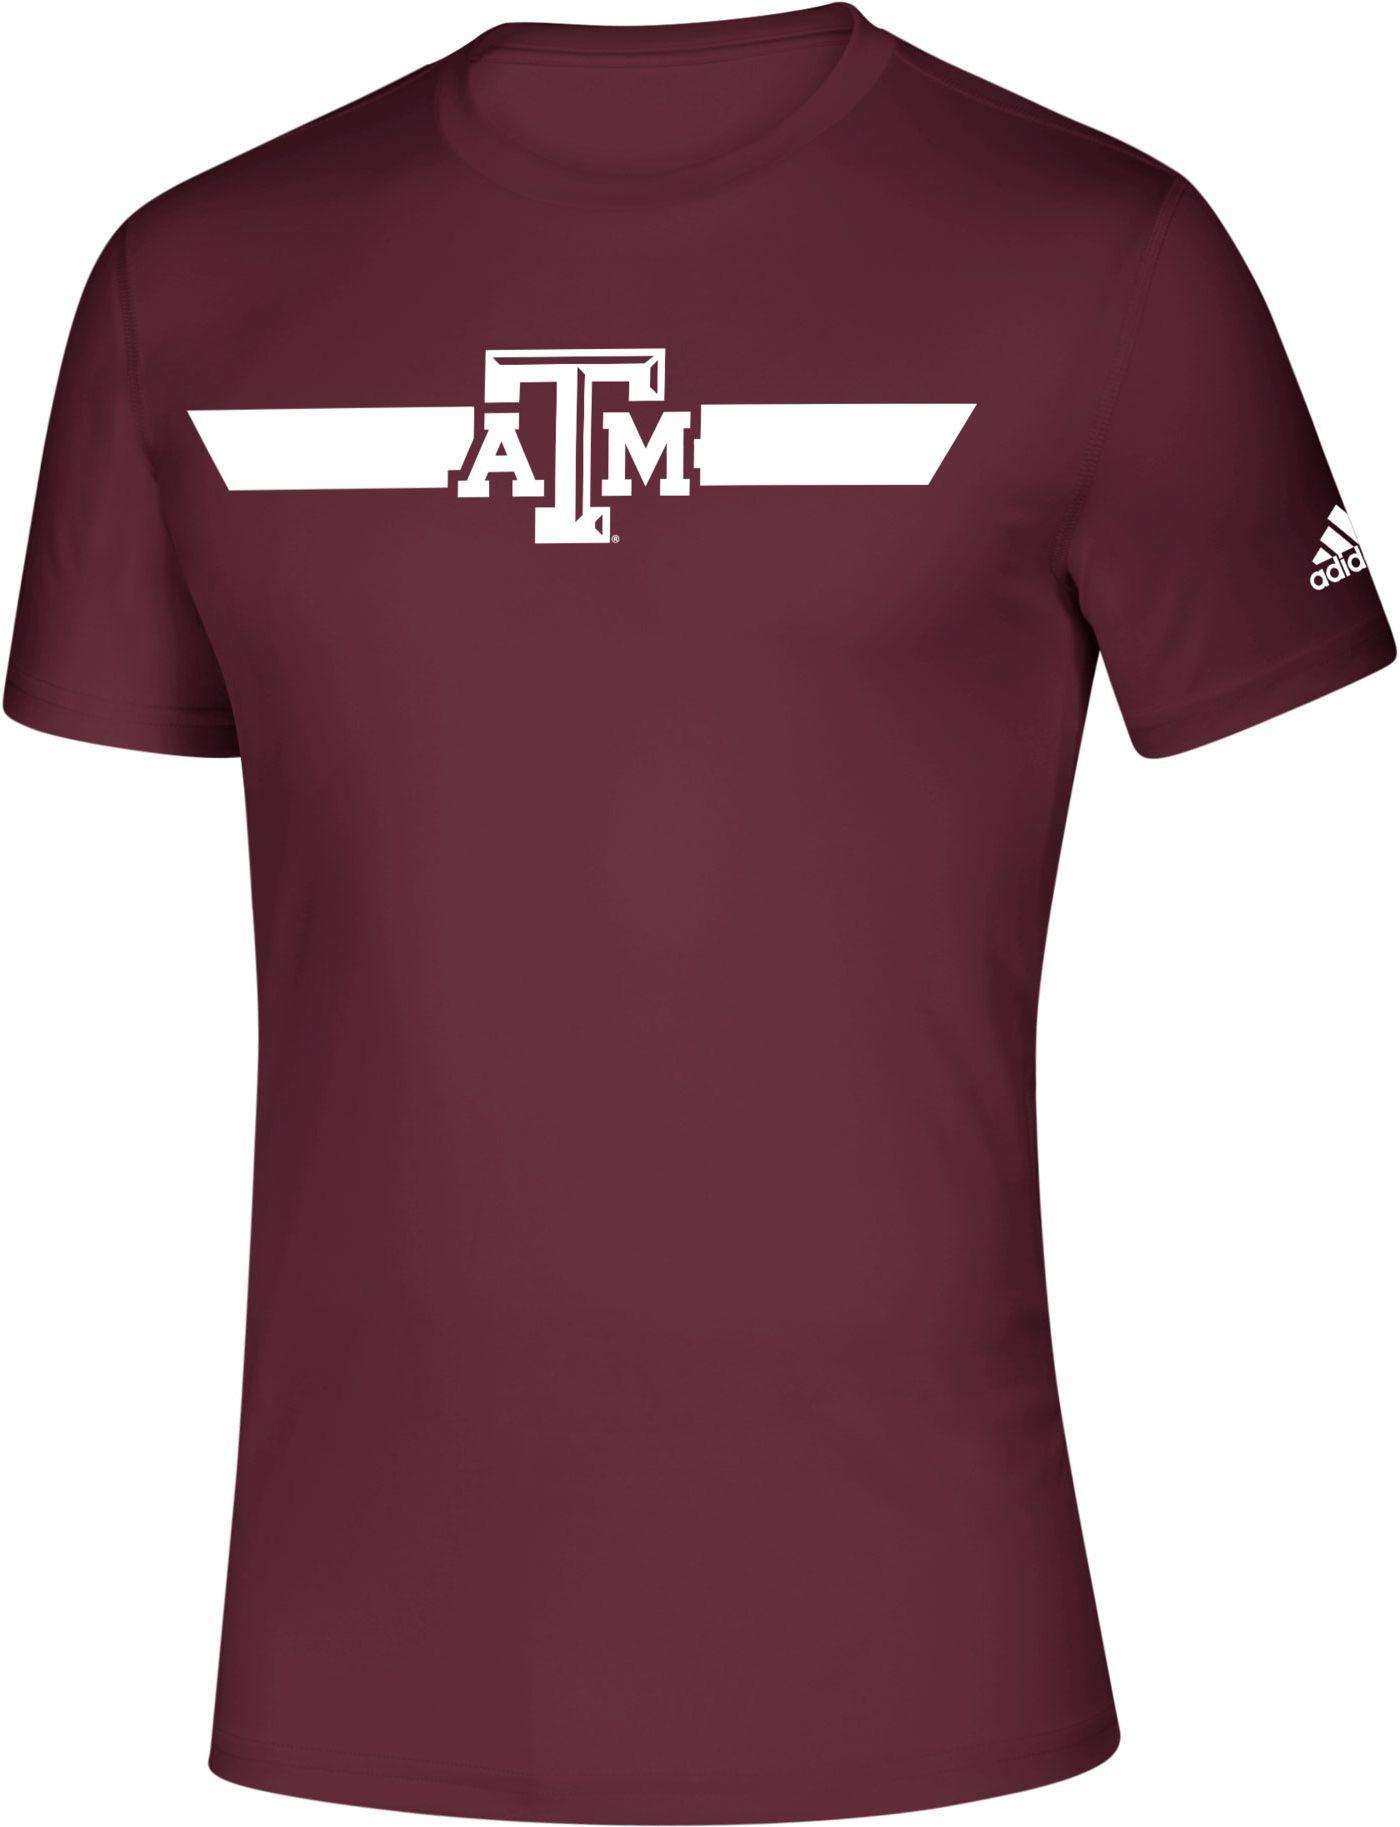 adidas Men's Texas A&M Aggies Maroon Locker Stripe Sideline T-Shirt